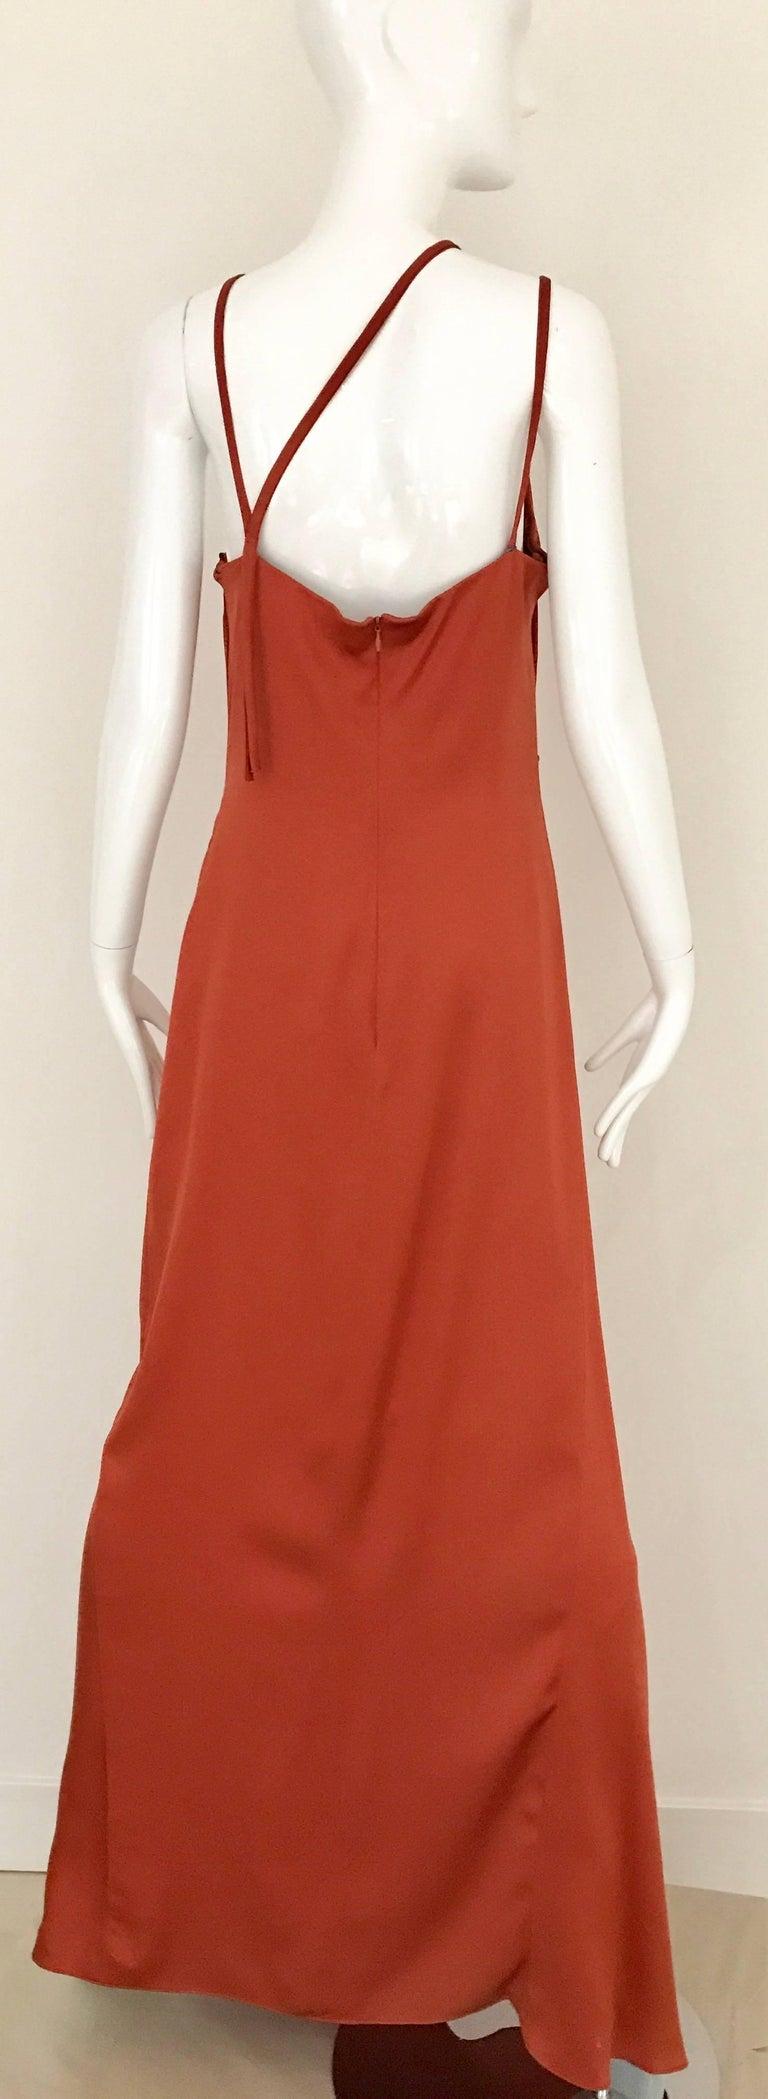 1990s BILL BLASS Burnt Orange Silk Charmeuse Asymetrical Neckline Dress For Sale 1